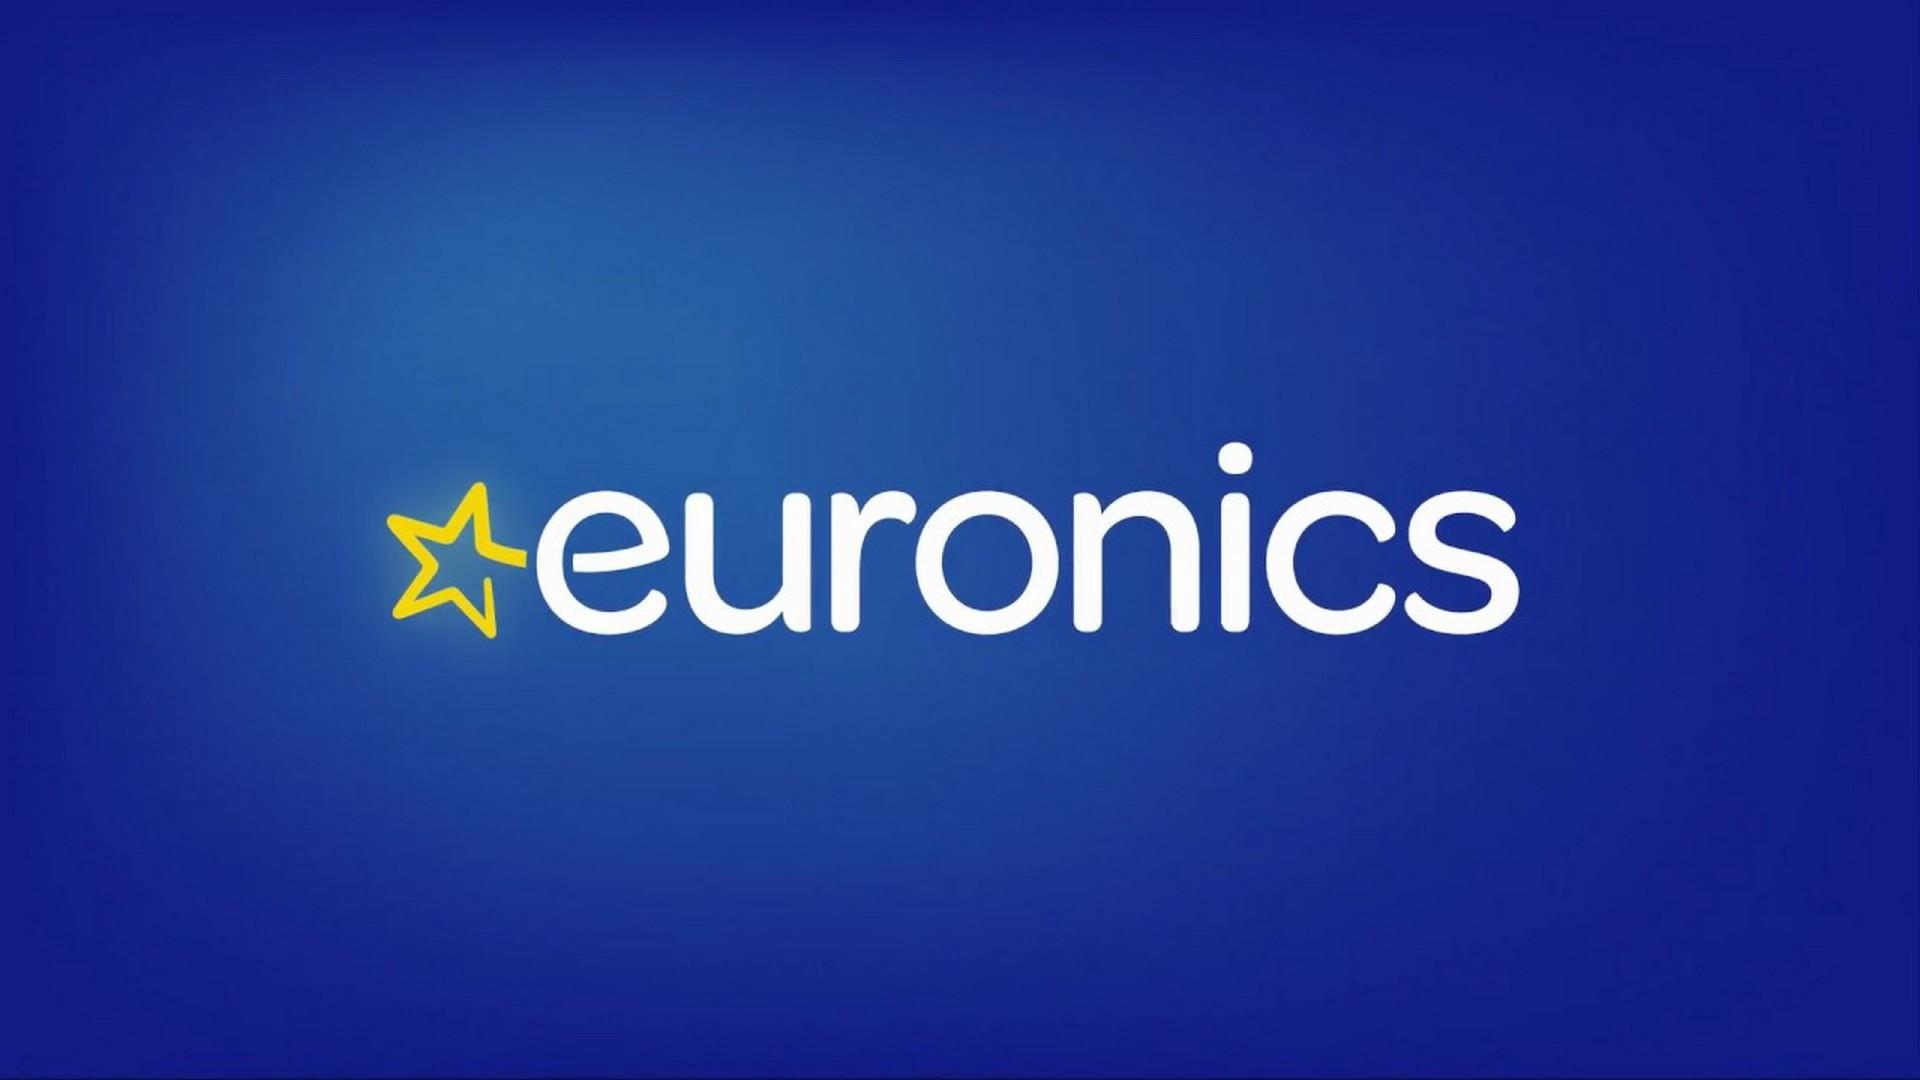 Euronics (1) logo